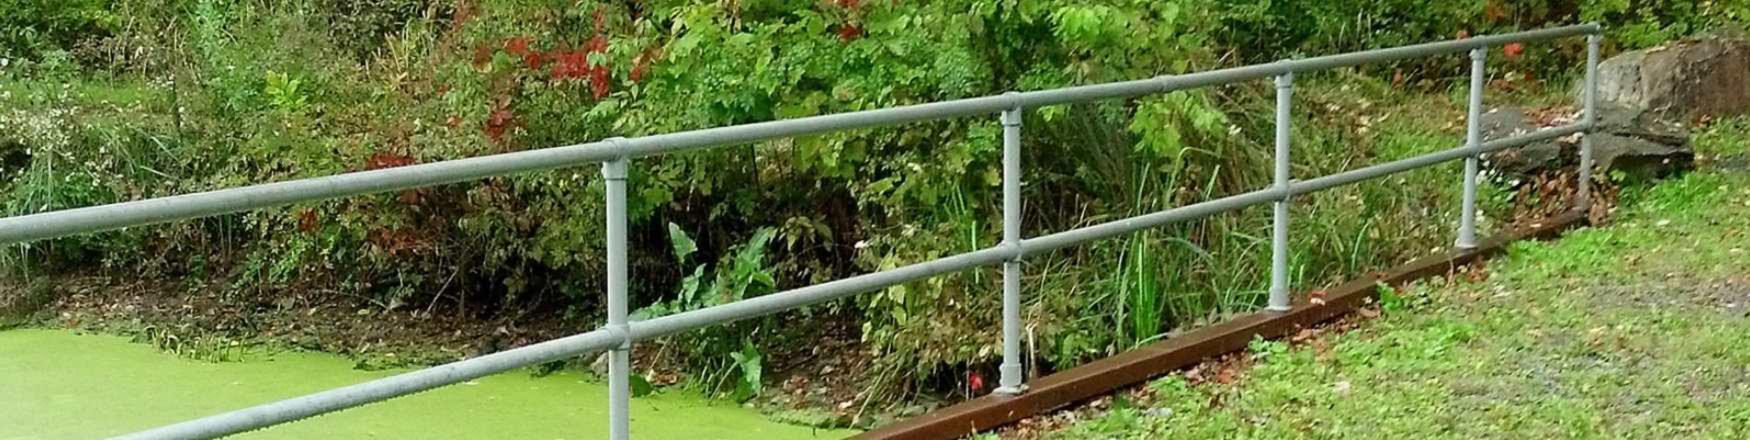 OSHA railing, guardrail system